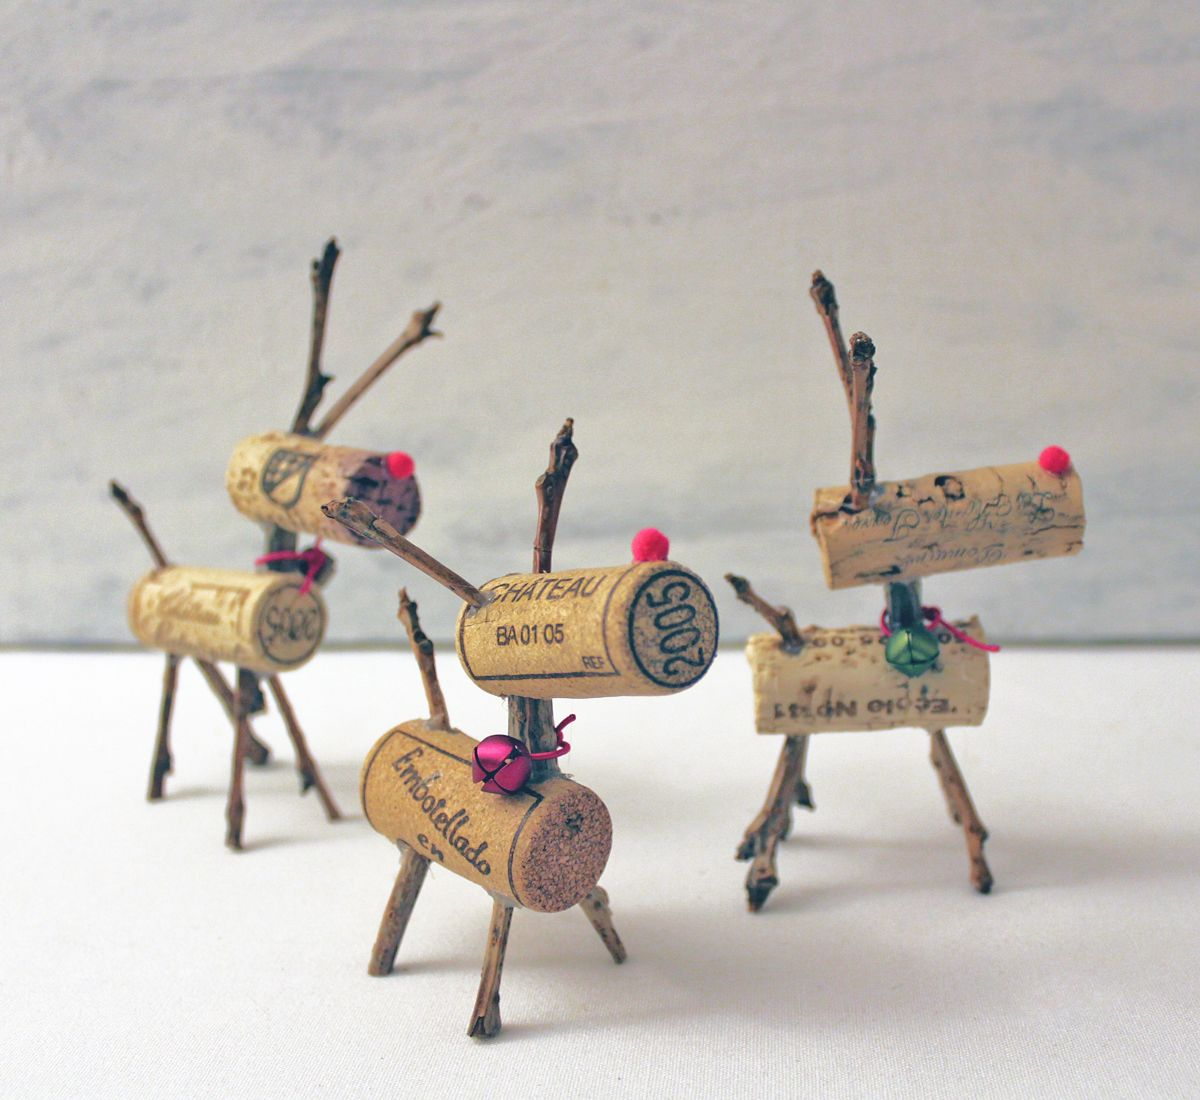 Adornos navide os hechos con corchos de vino corchos for Adornos navidenos hechos con reciclaje